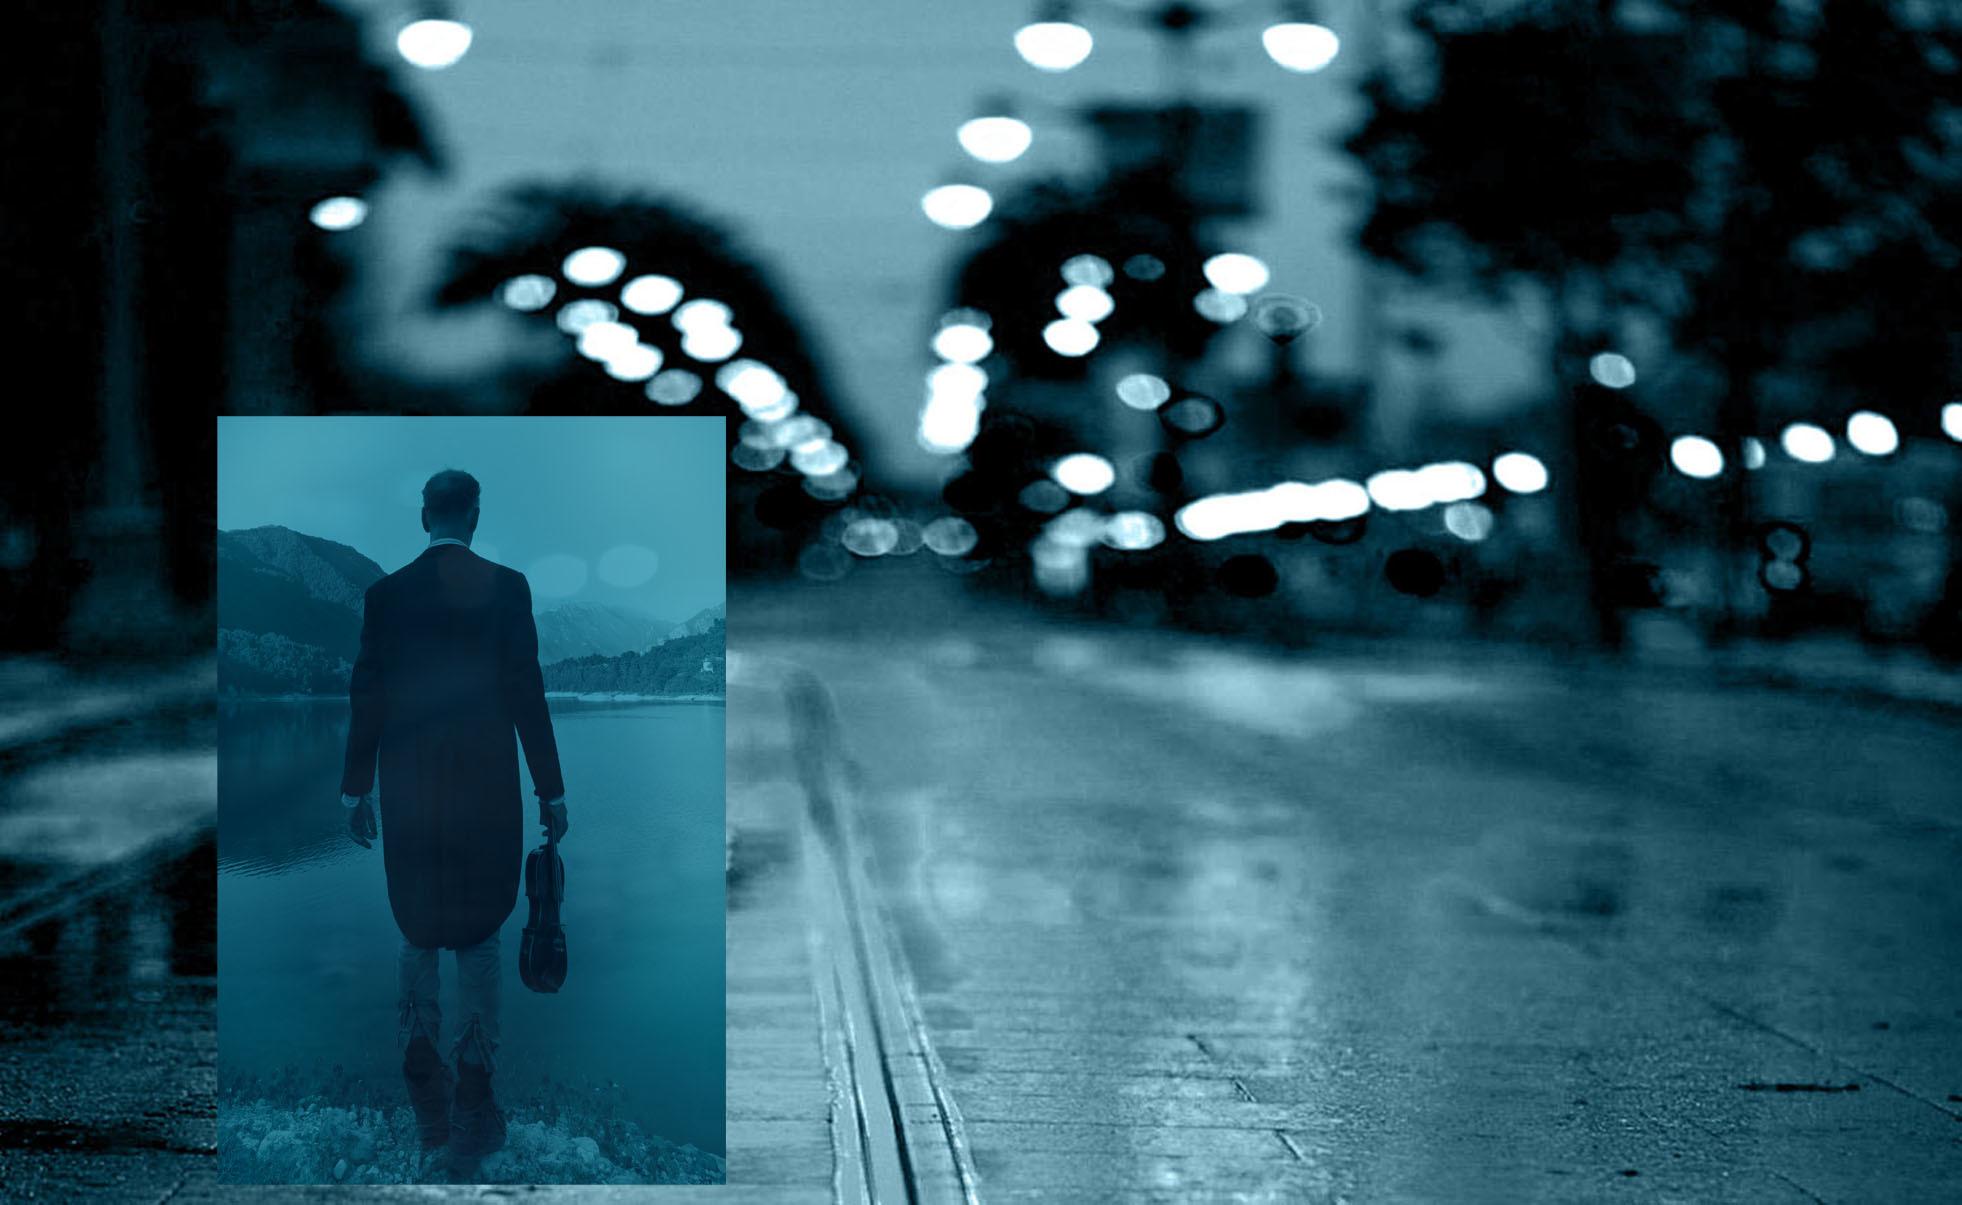 L'homme qui marche | Ados Cirque